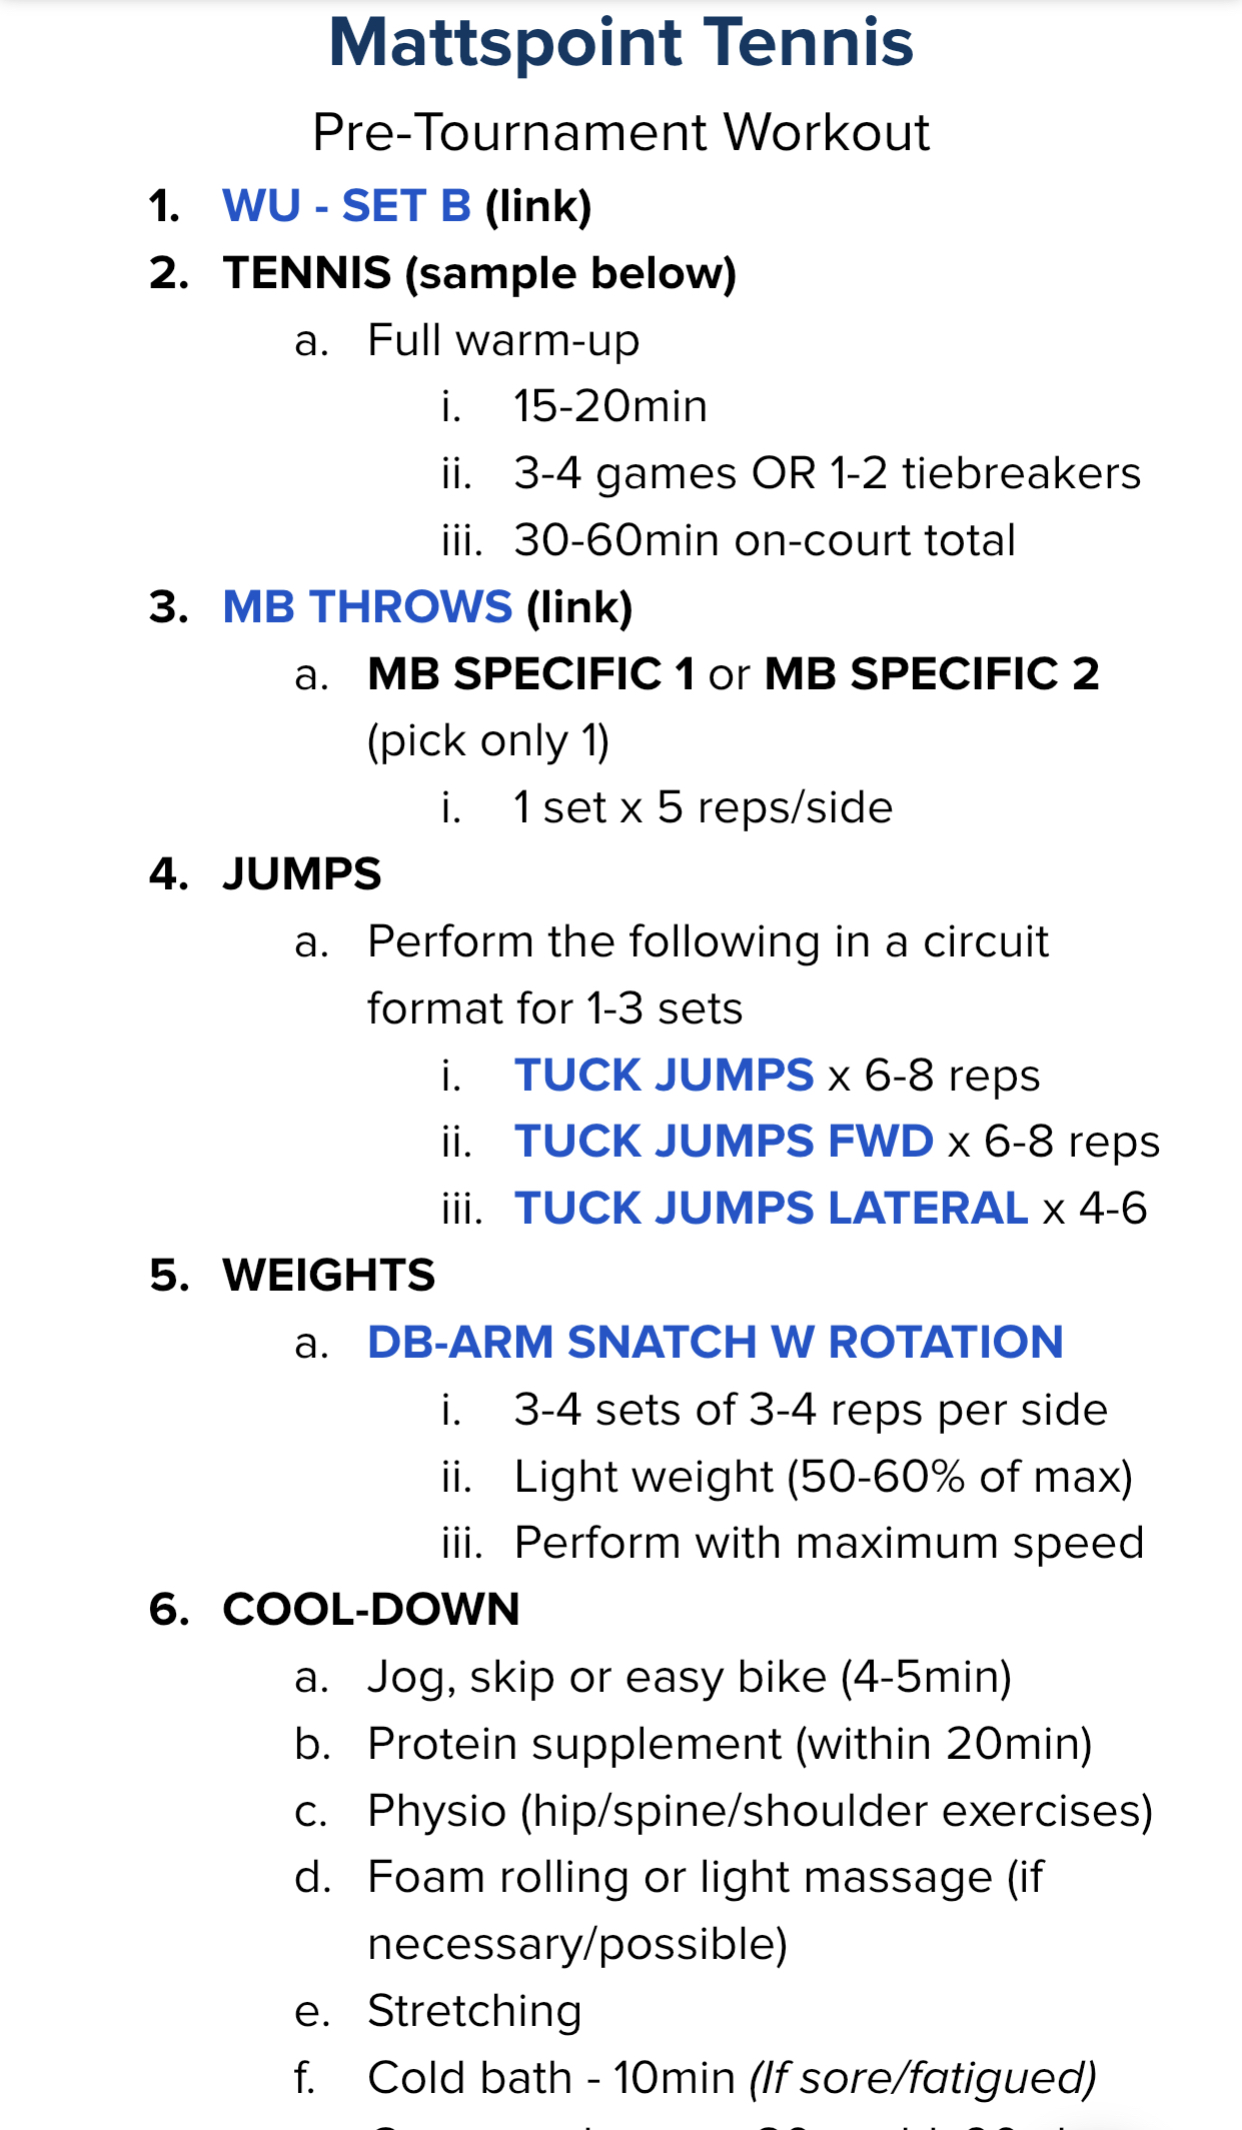 Sample pre-tournament workout.